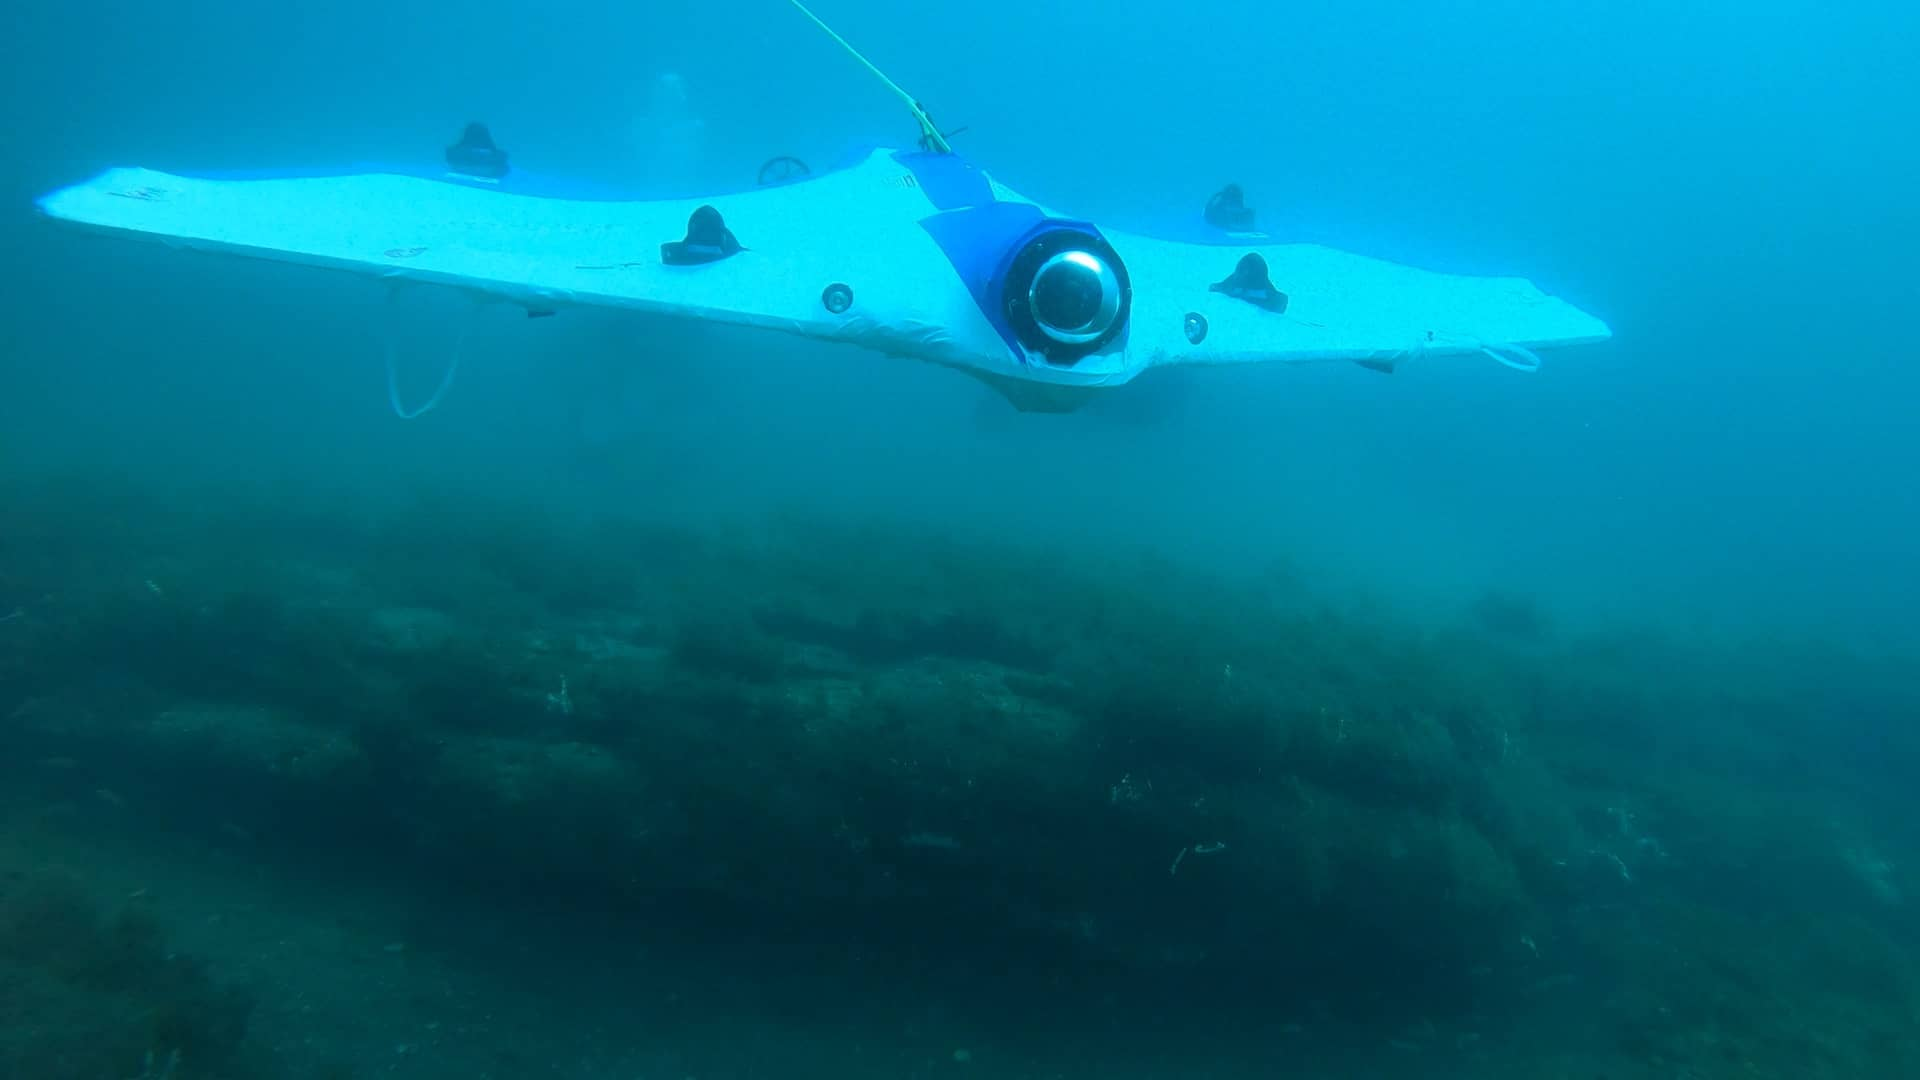 SeaSearcher In Its Full Glory